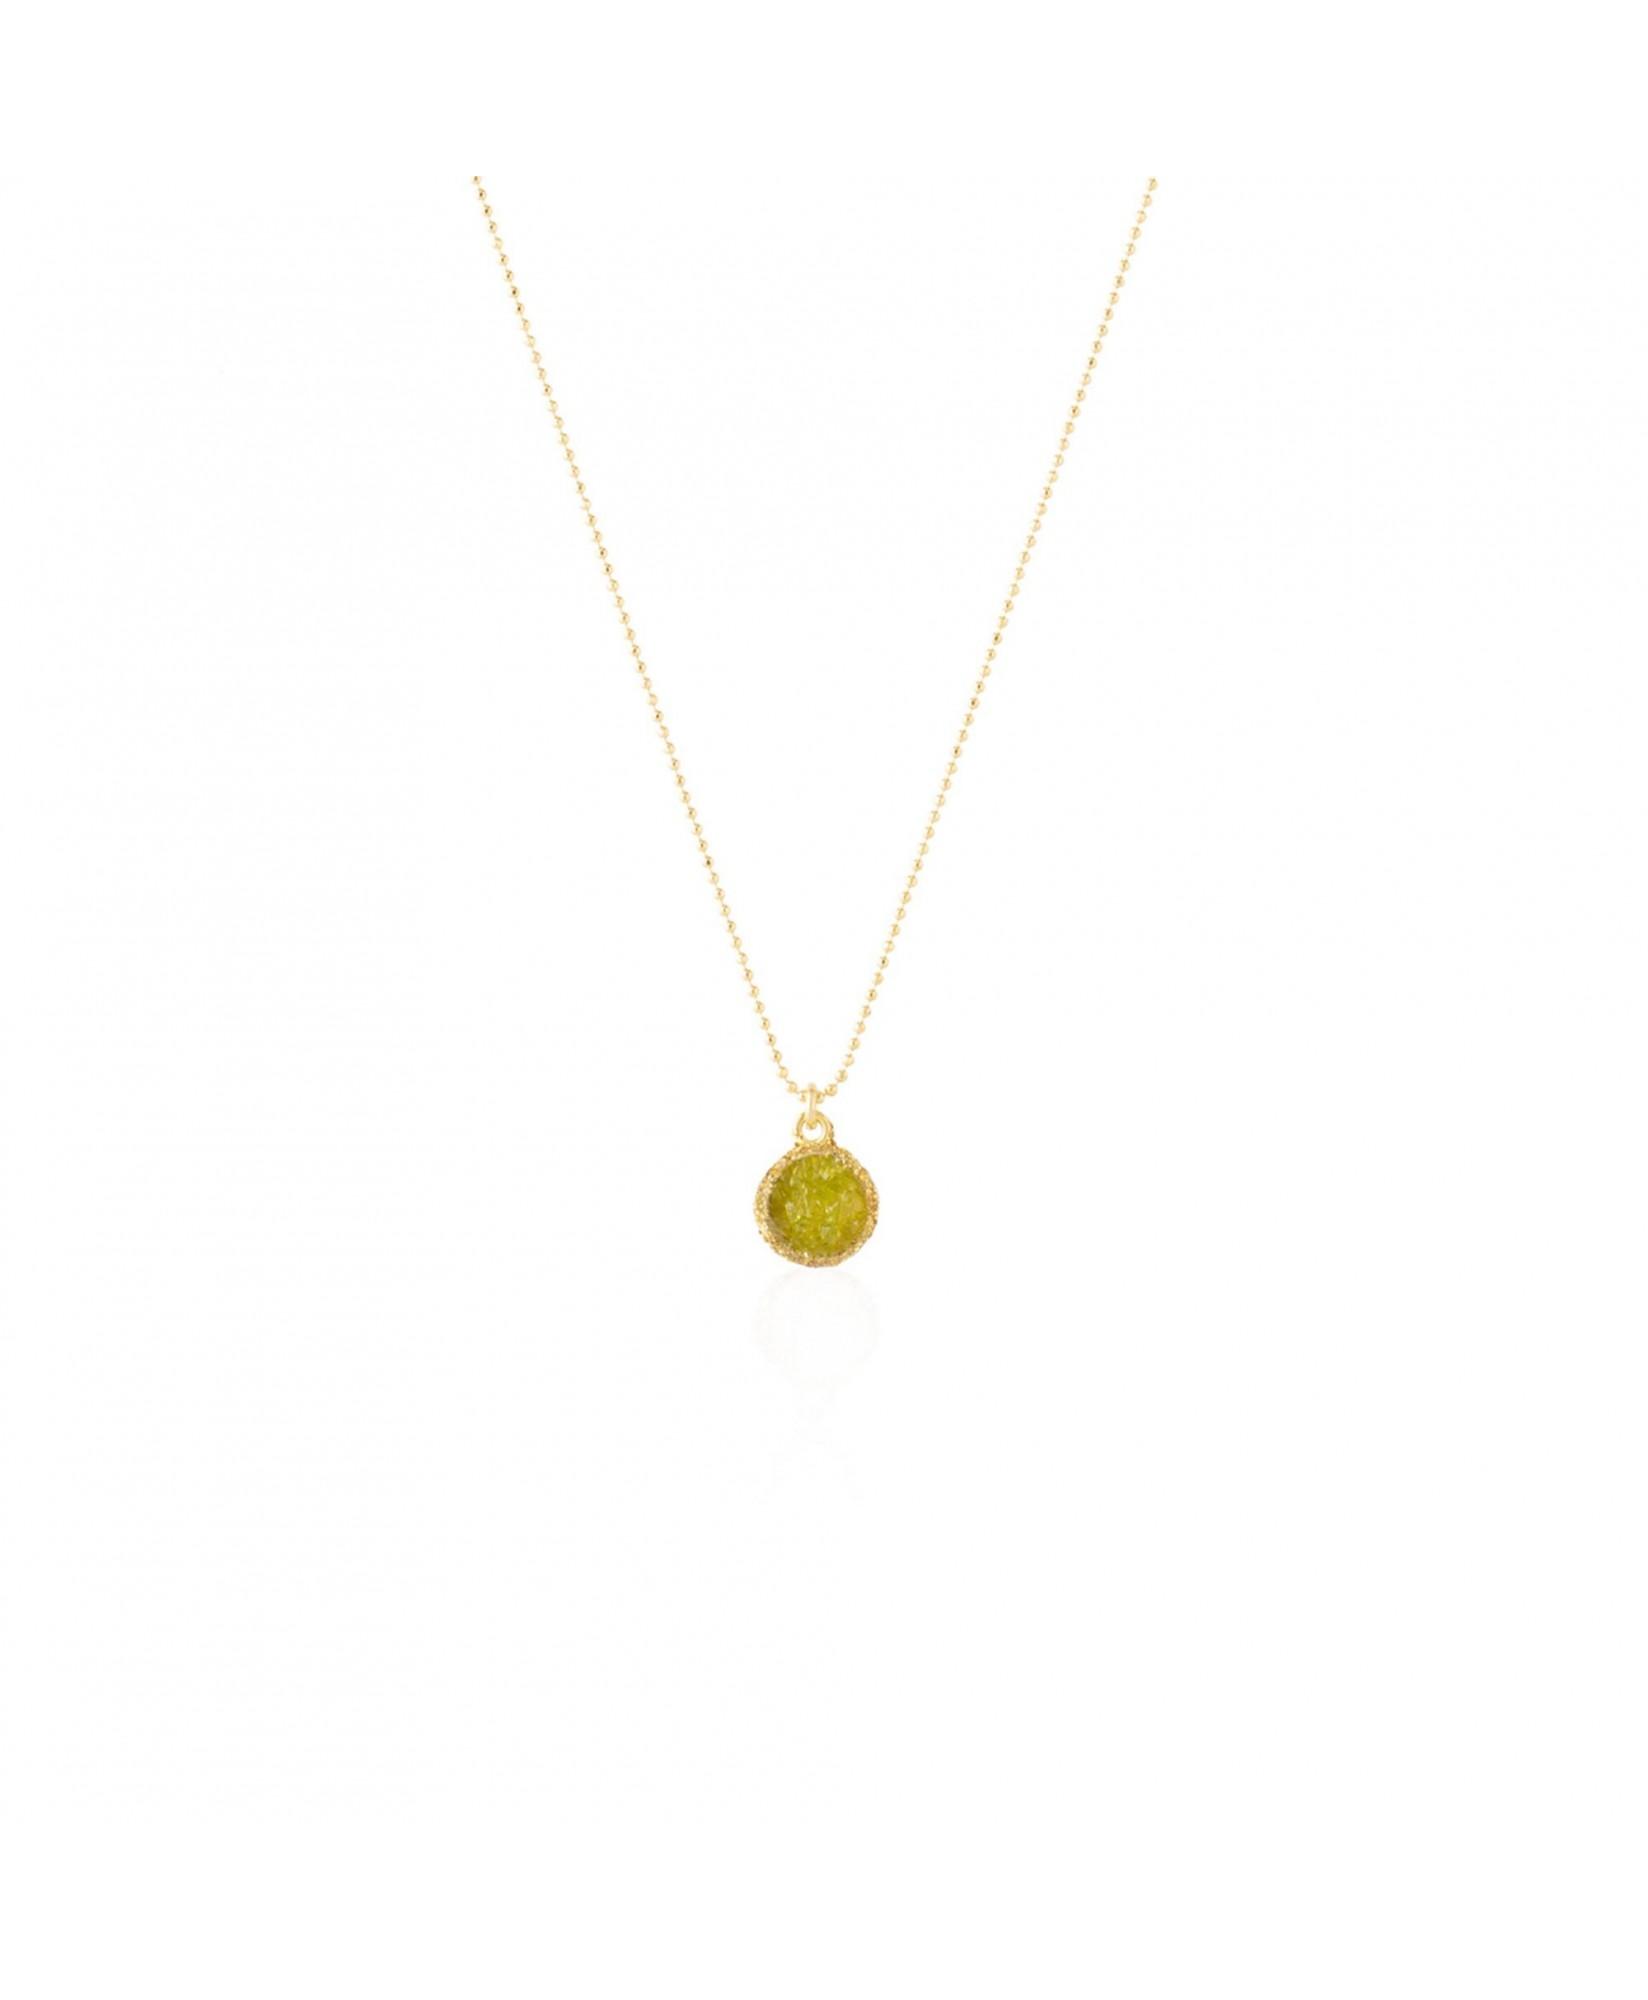 Gargantilla oro Olivine con colgante verde de olivina